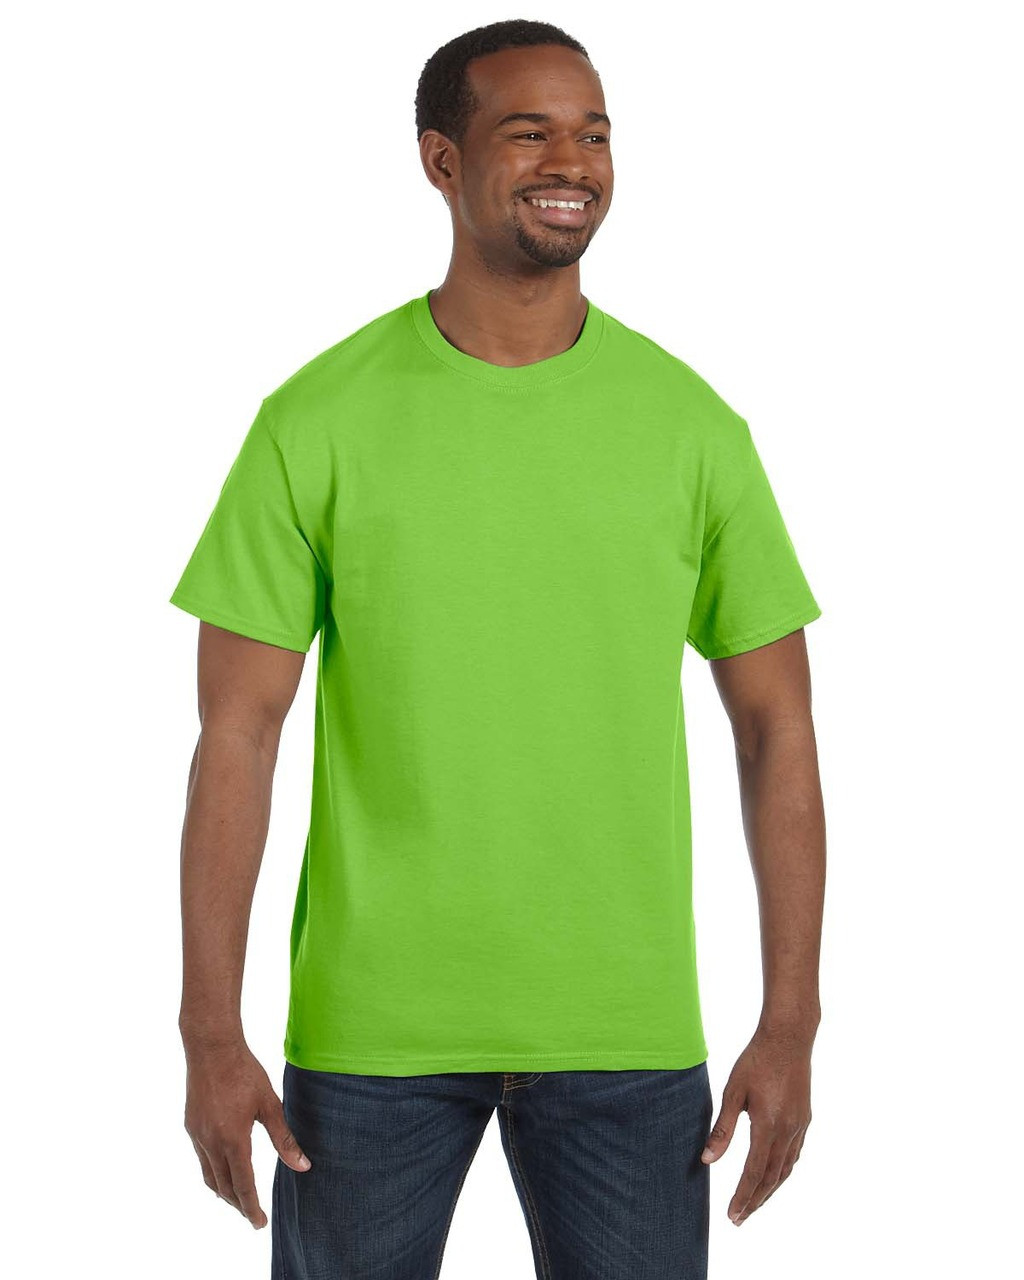 f9be8efb3e 5 Pack - Heavy Cotton T-Shirt - Gildan 5000G